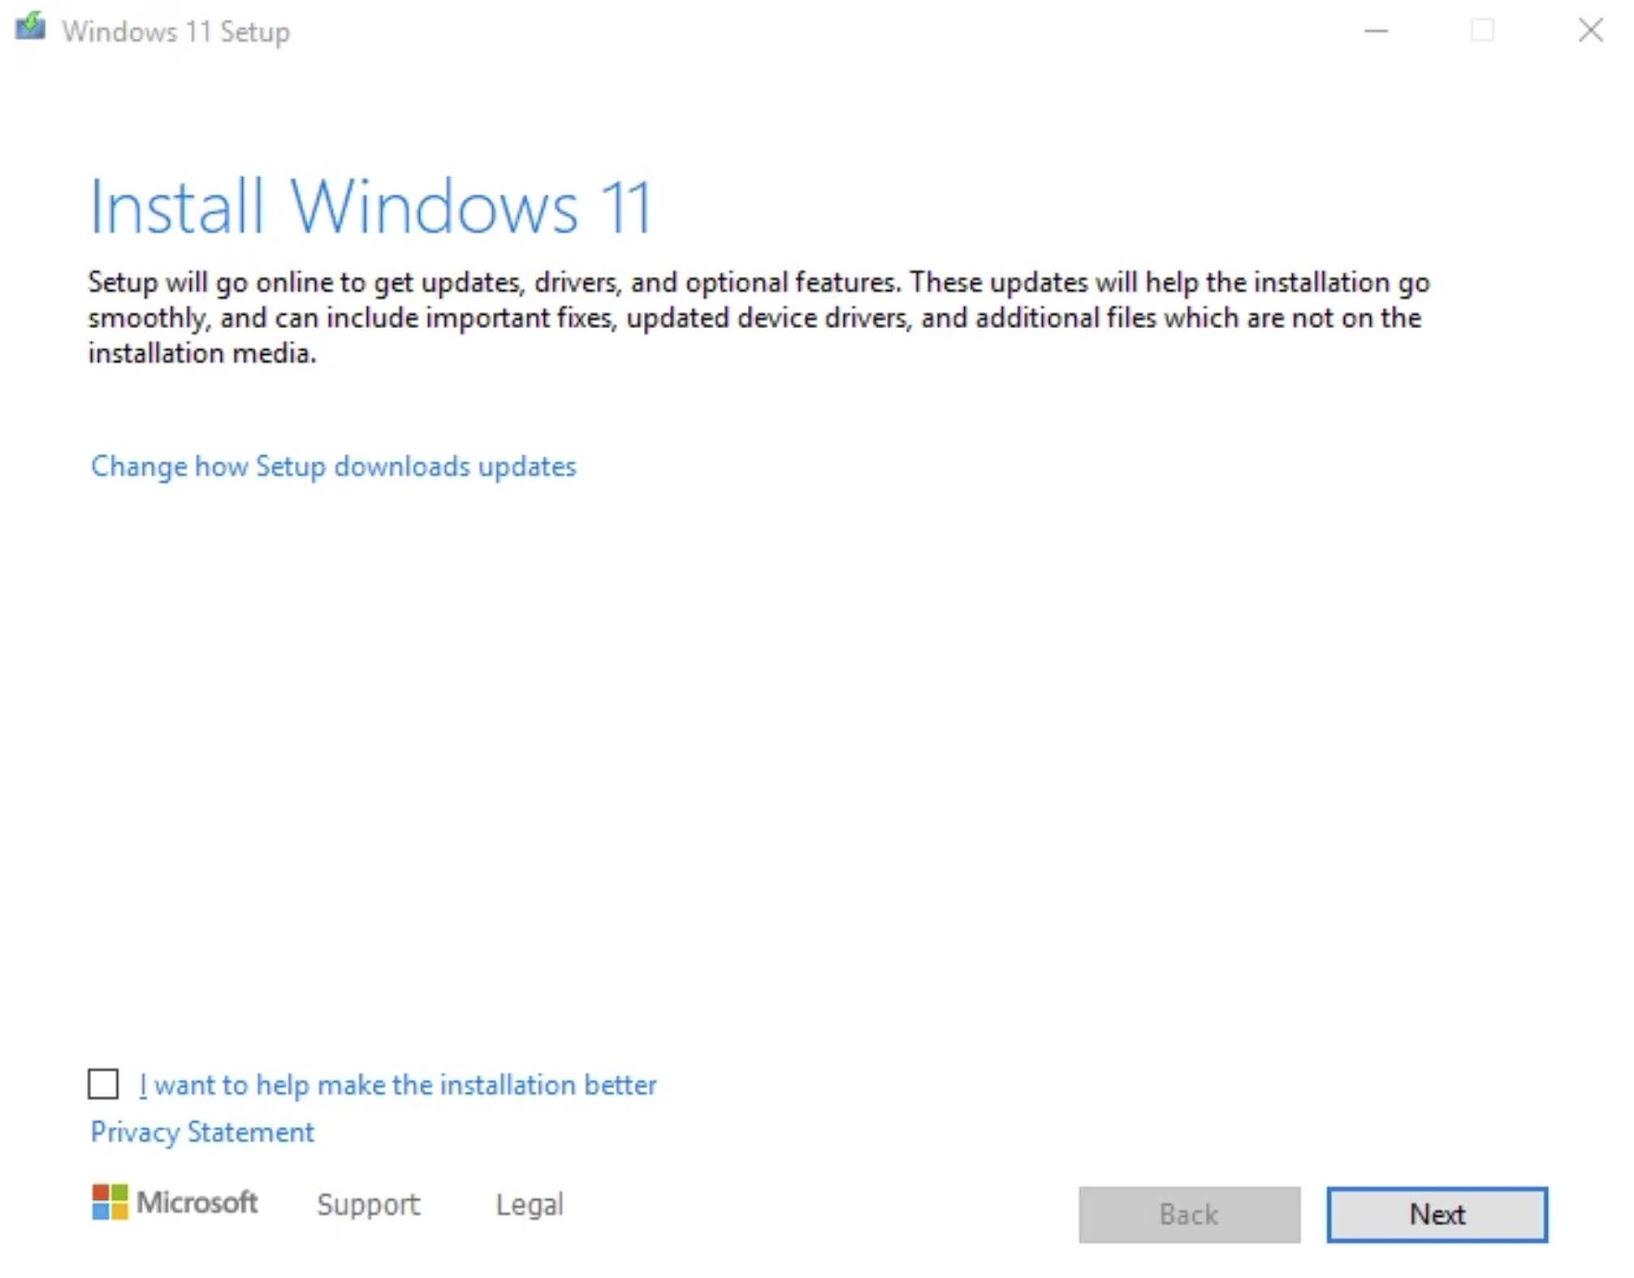 The Windows 11 Setup wizard will display.